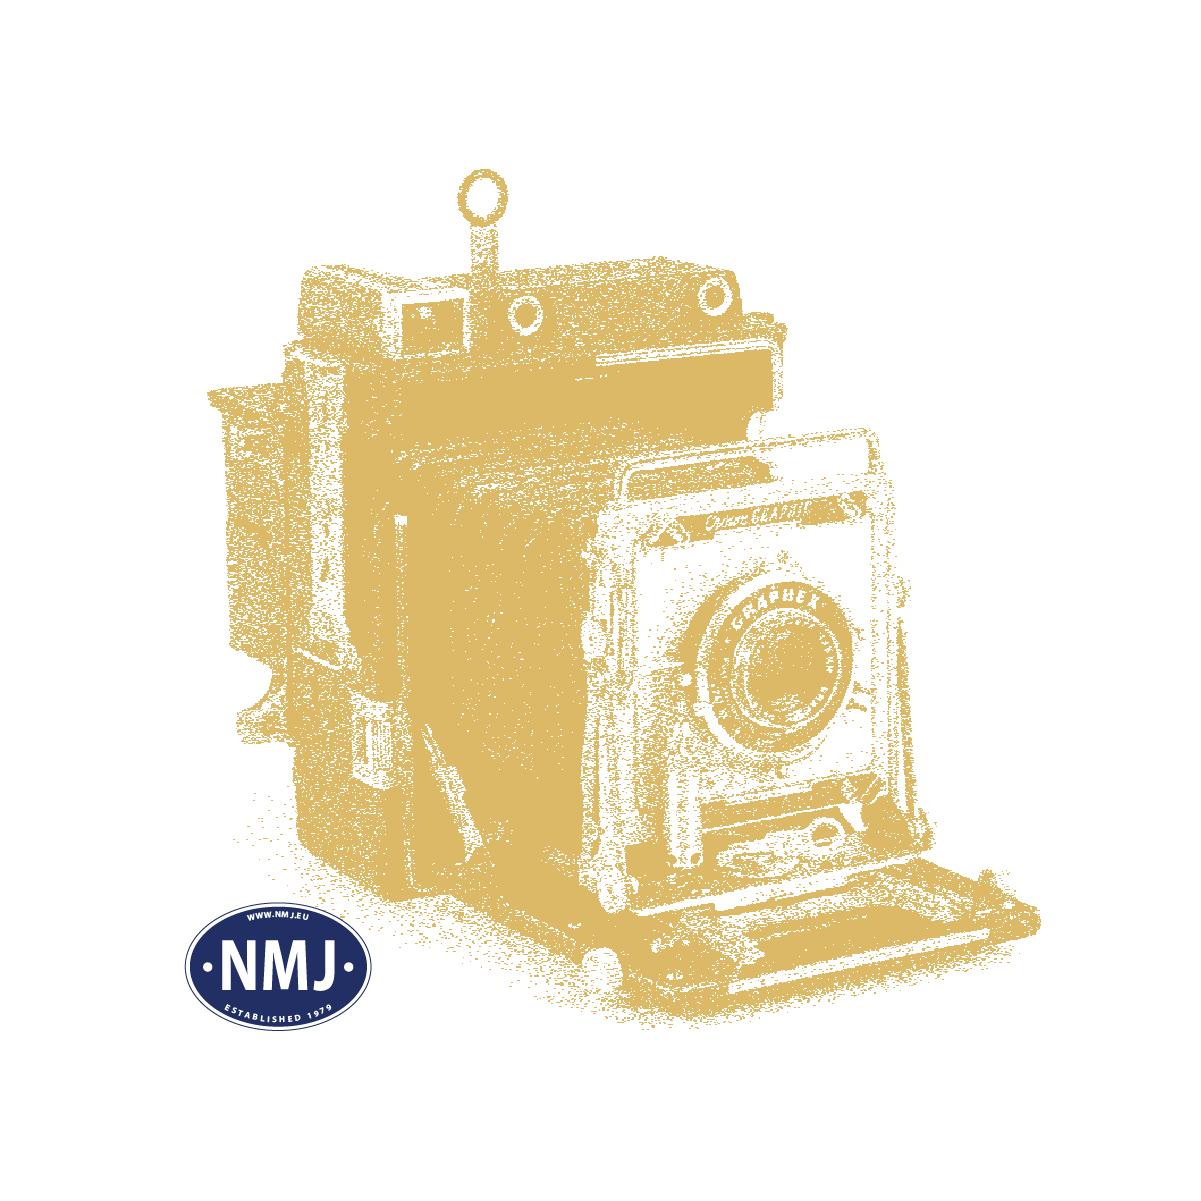 NMJB1136 - Canon CN-22, 2x Schwungmasse, 2x Kardananschluss, DC